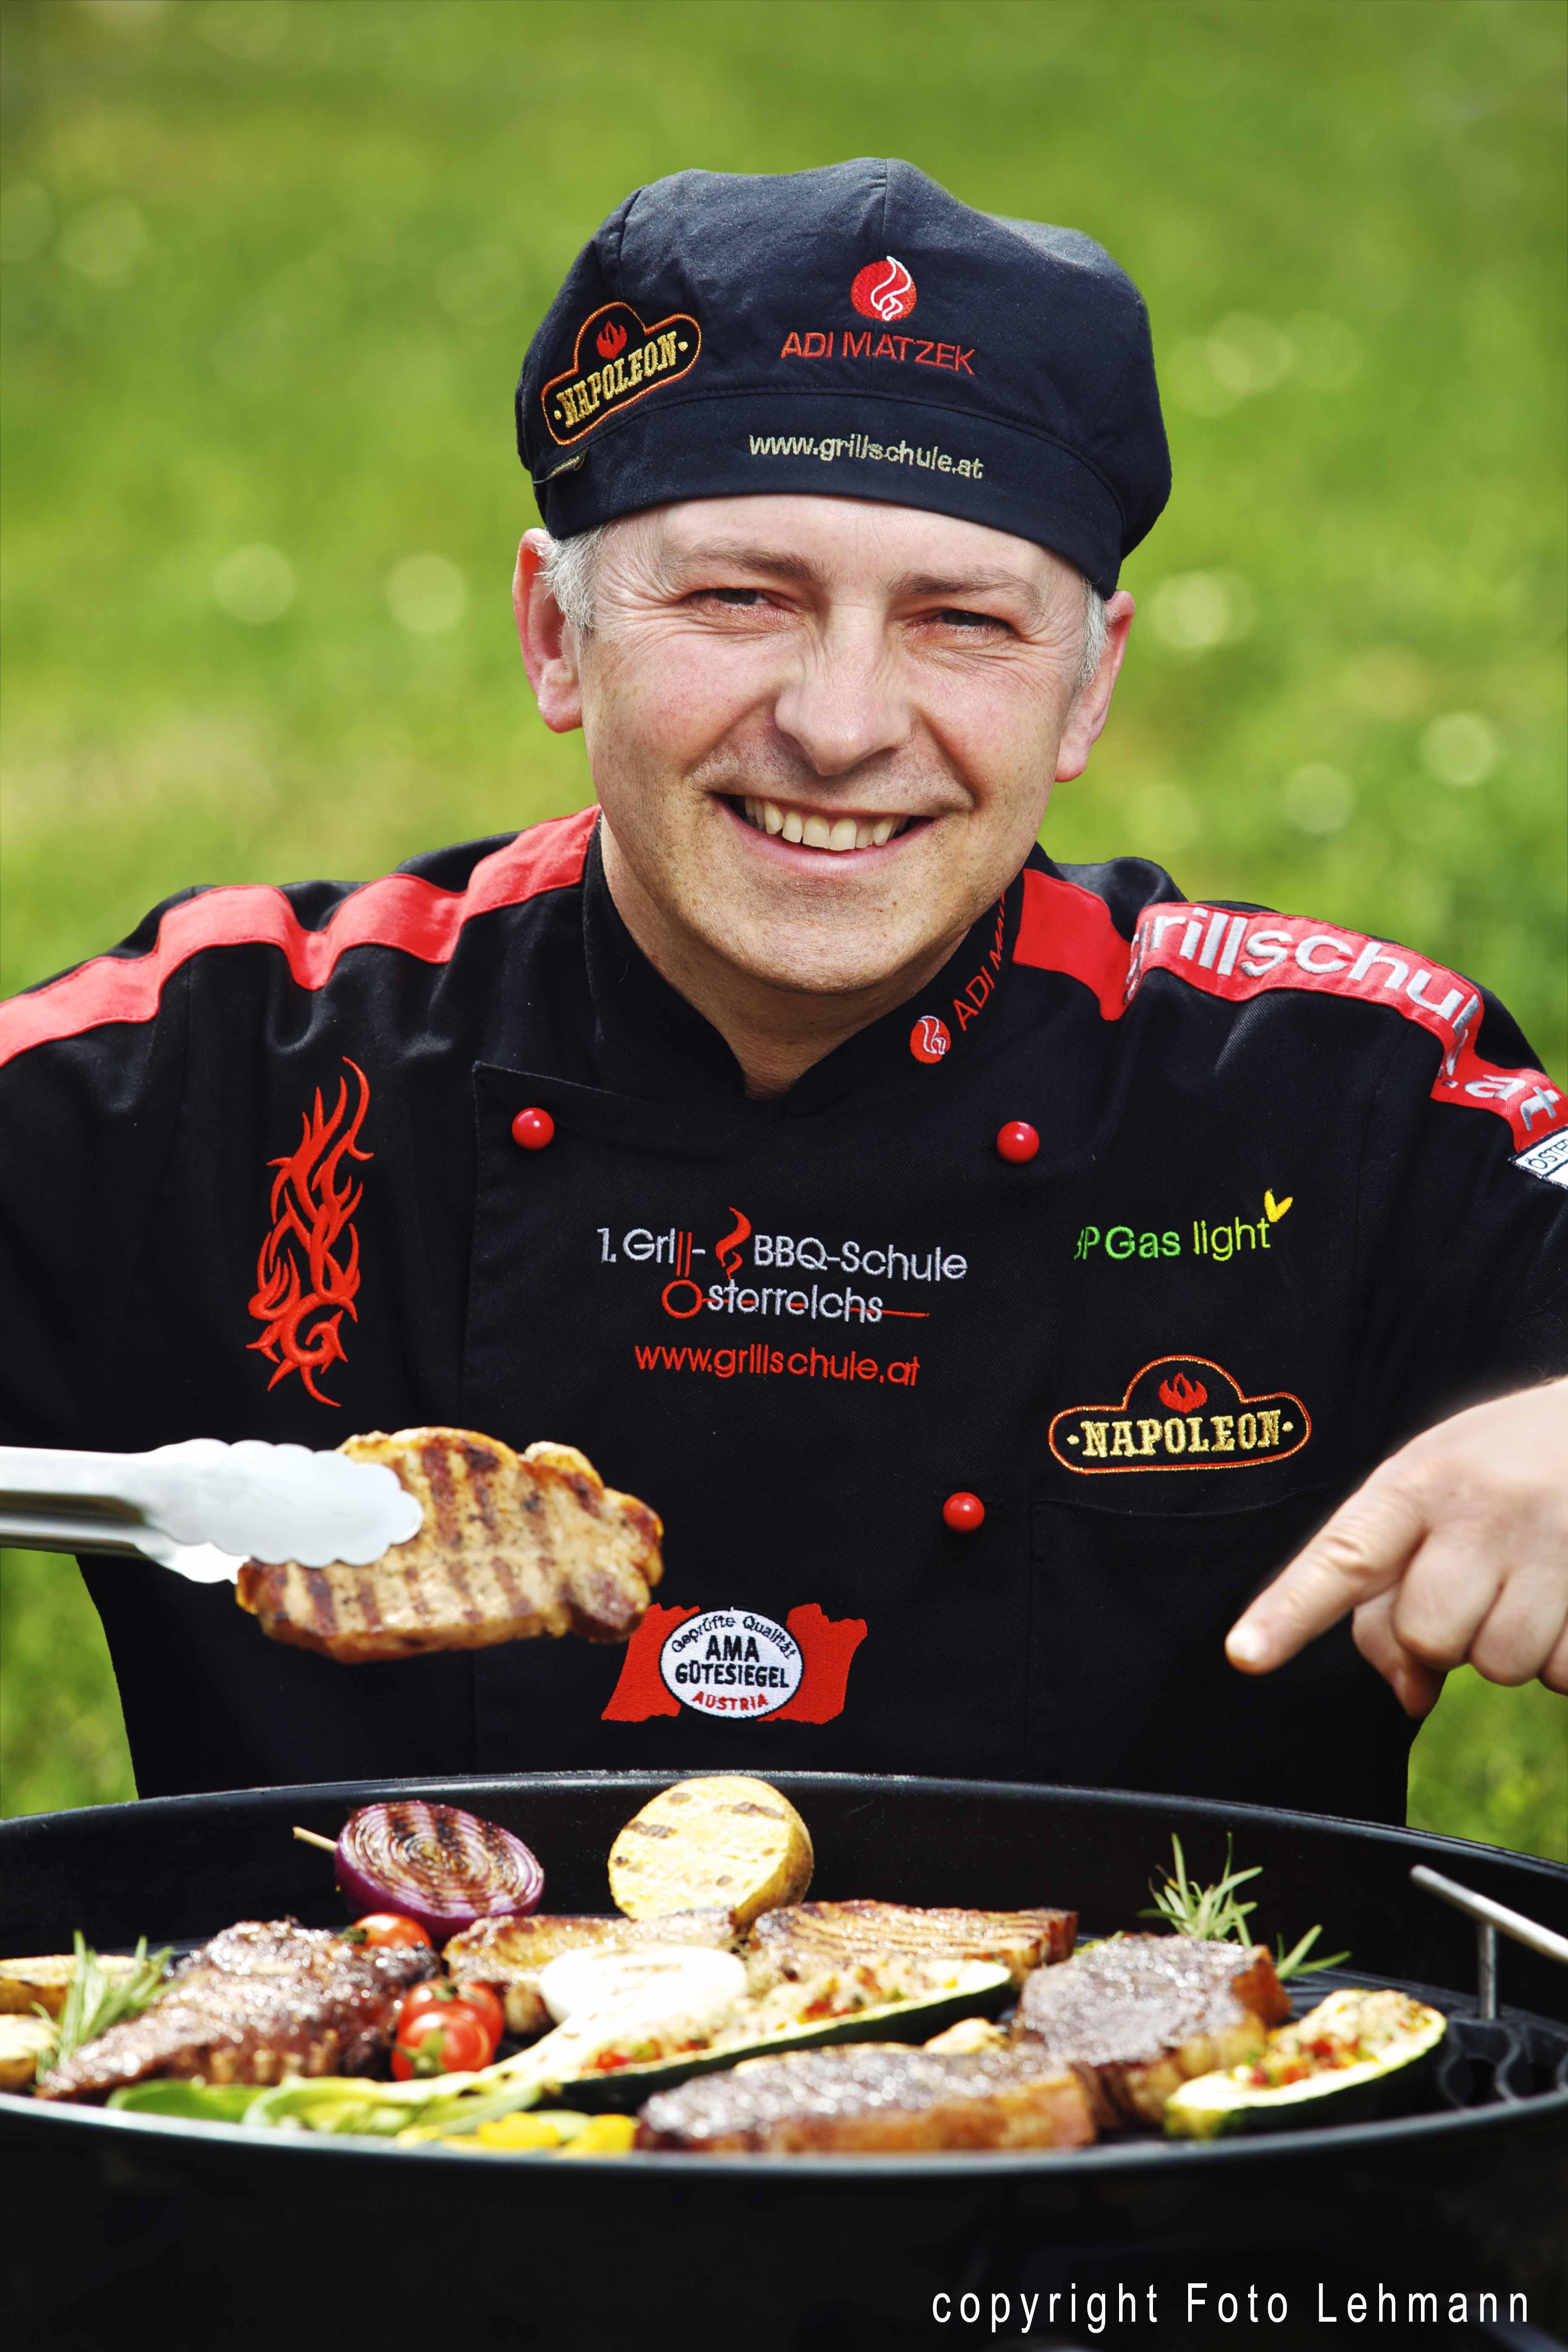 Adi Matzek Grillweltmeister